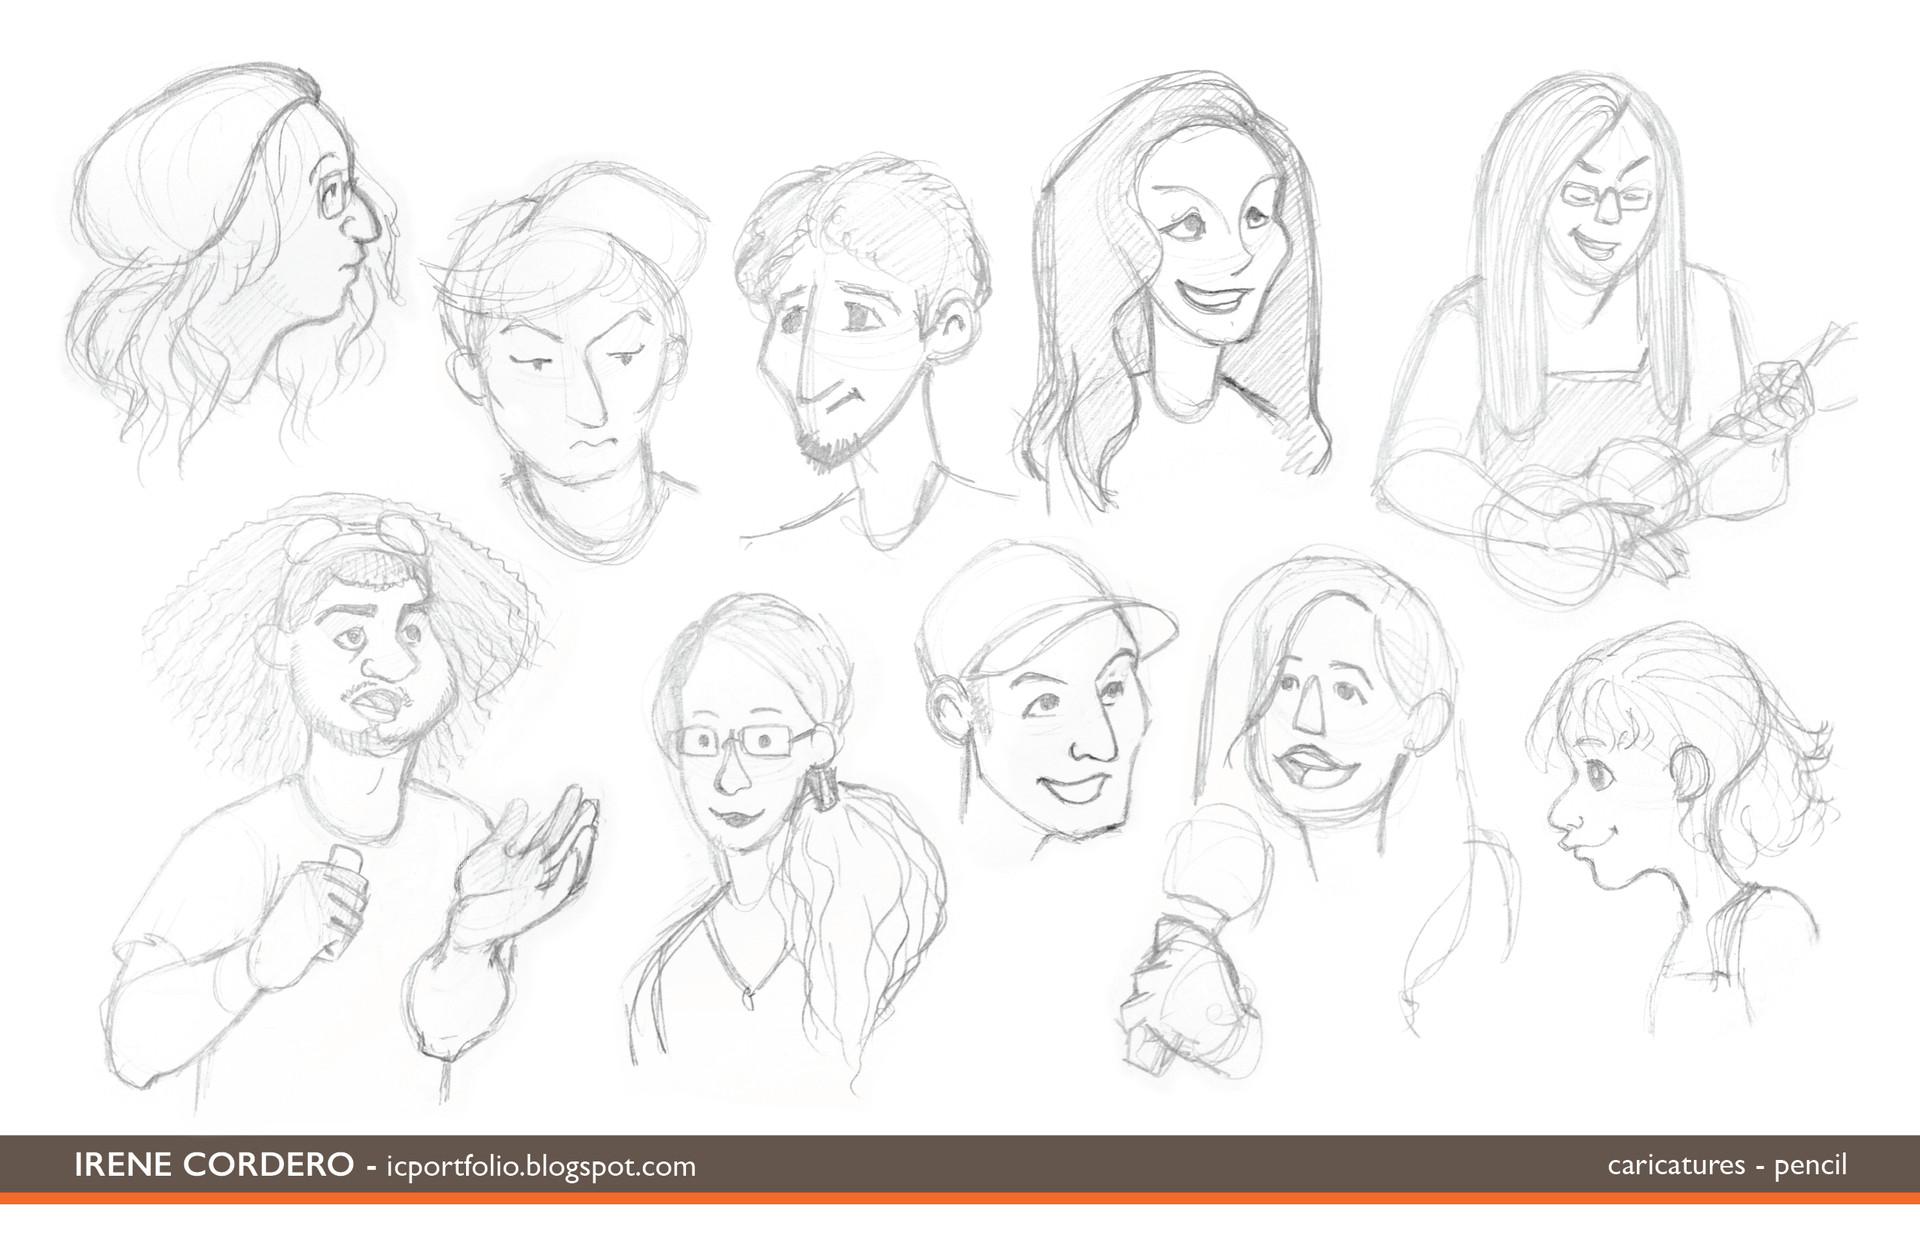 Irene cordero caricatures3